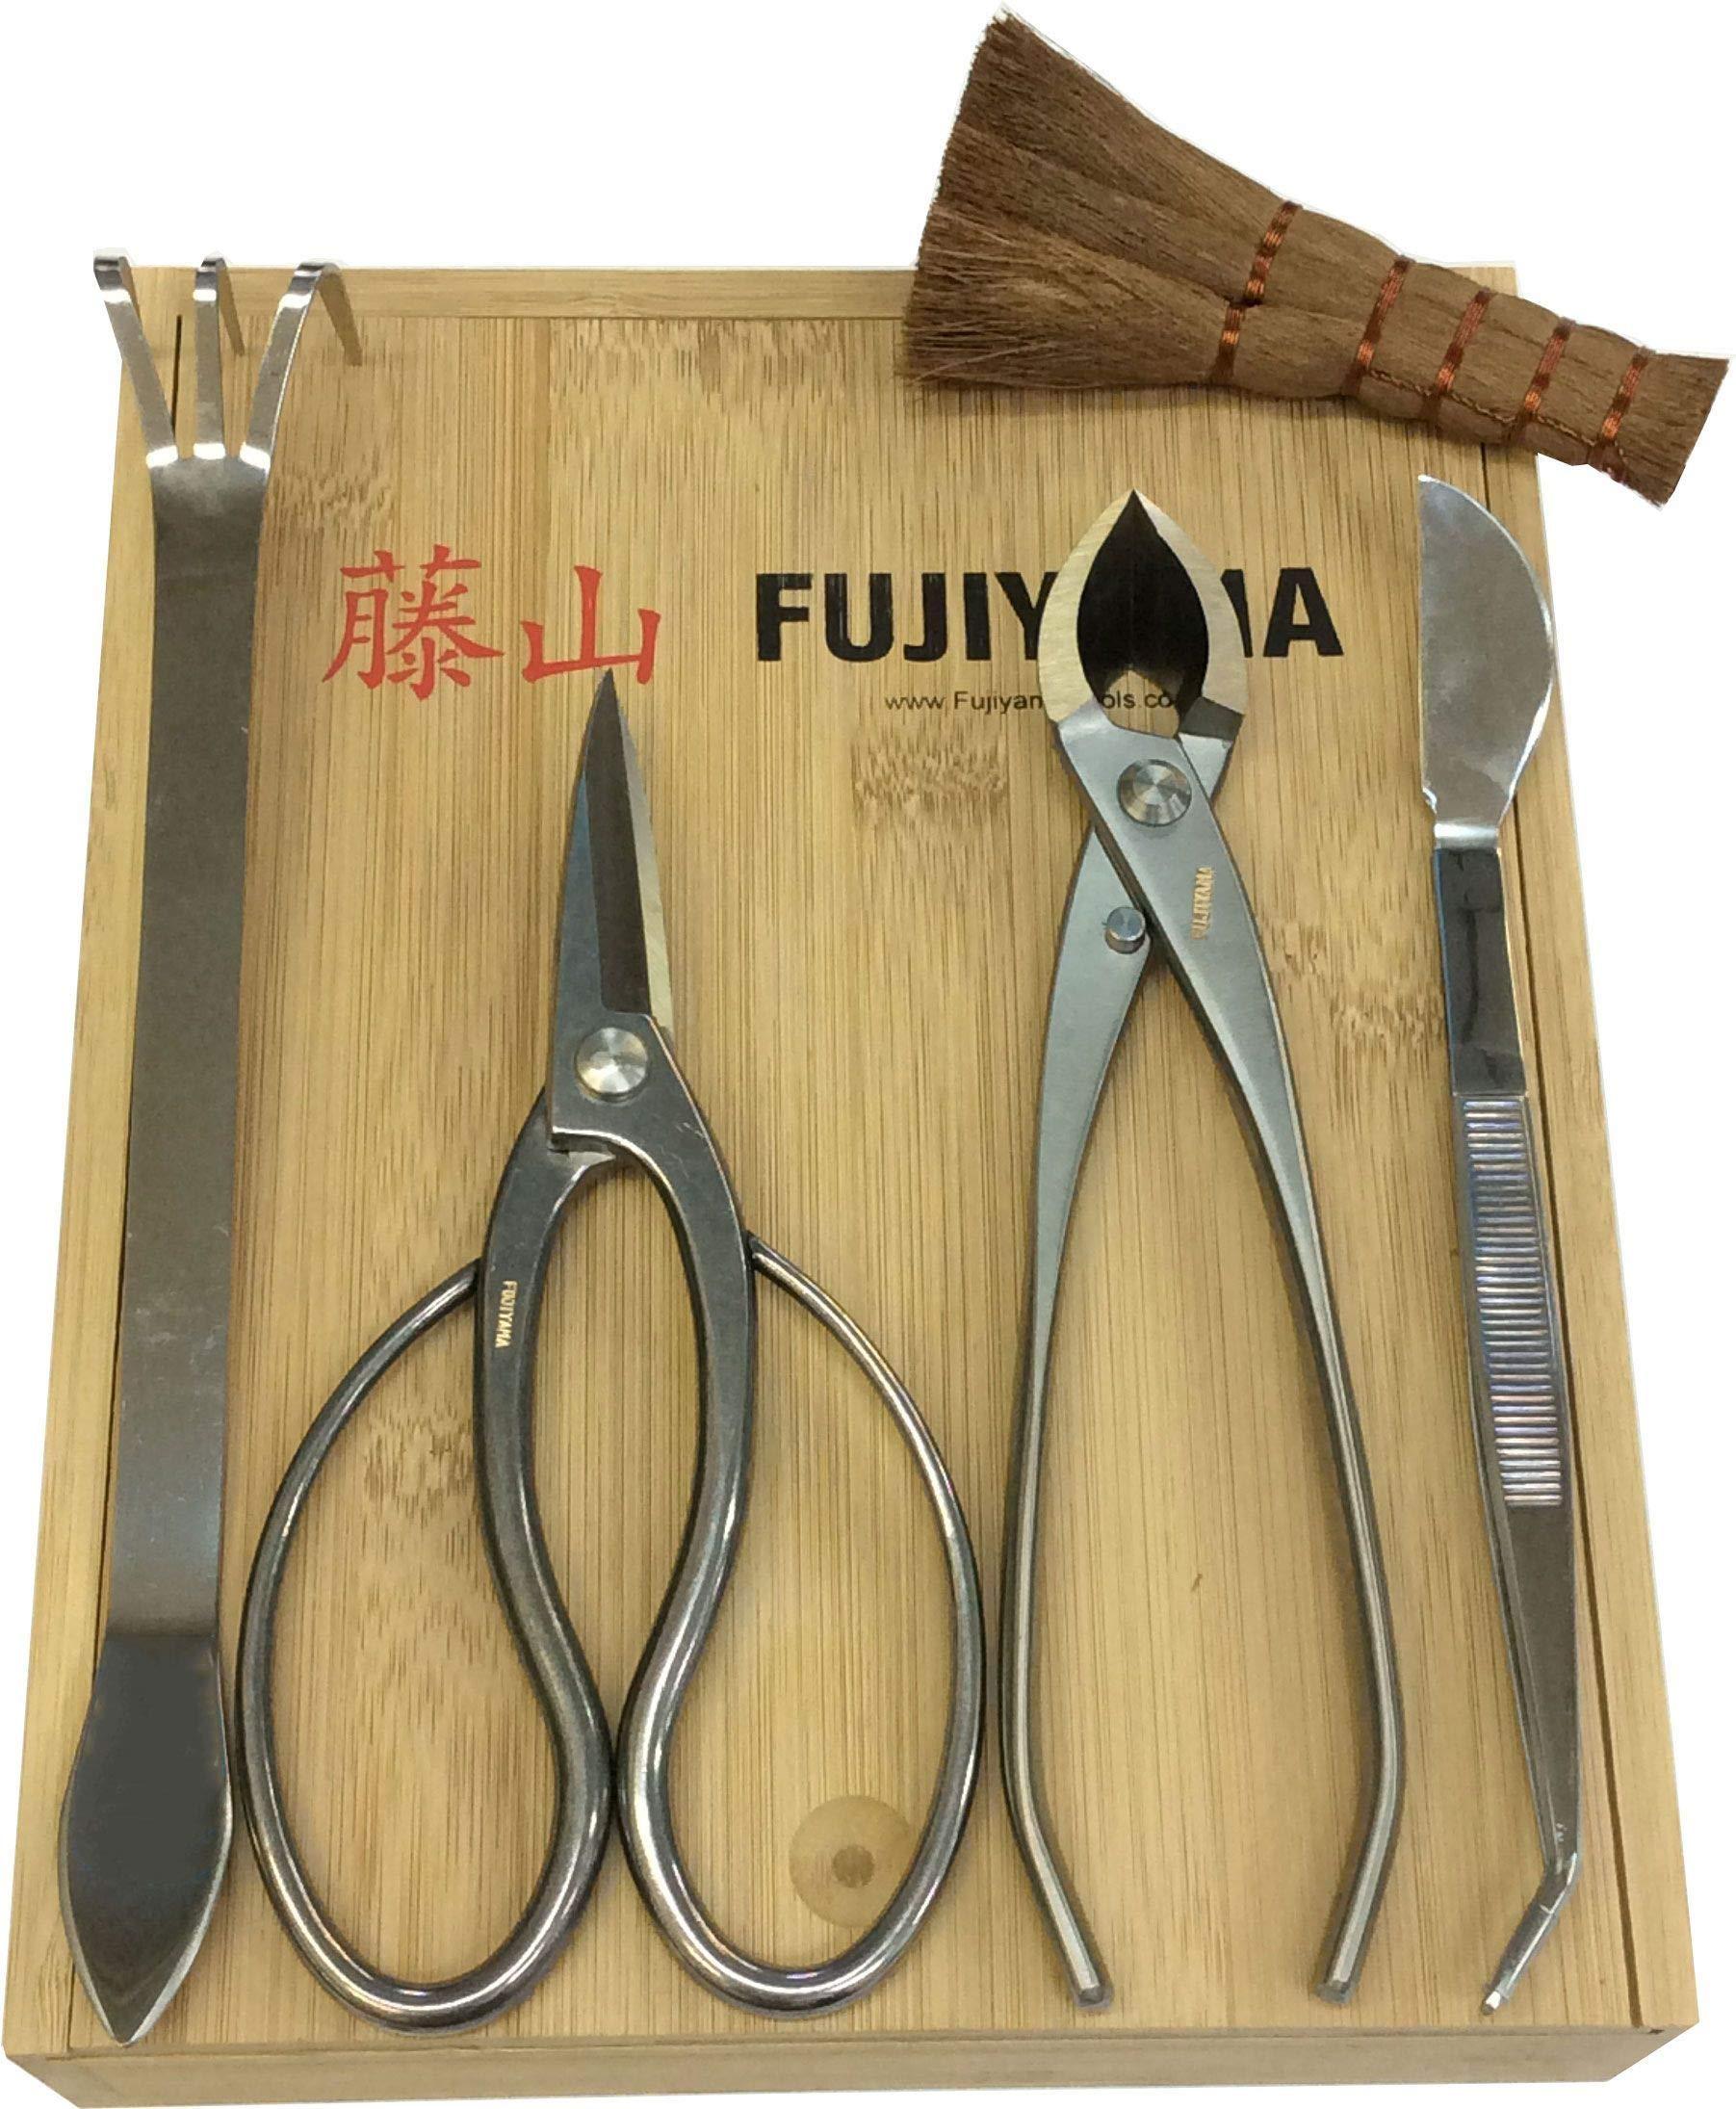 5 Piece Bonsai Tool Set By Fujiyama Stainless Steel Buy Online In Andorra At Andorra Desertcart Com Productid 60749999